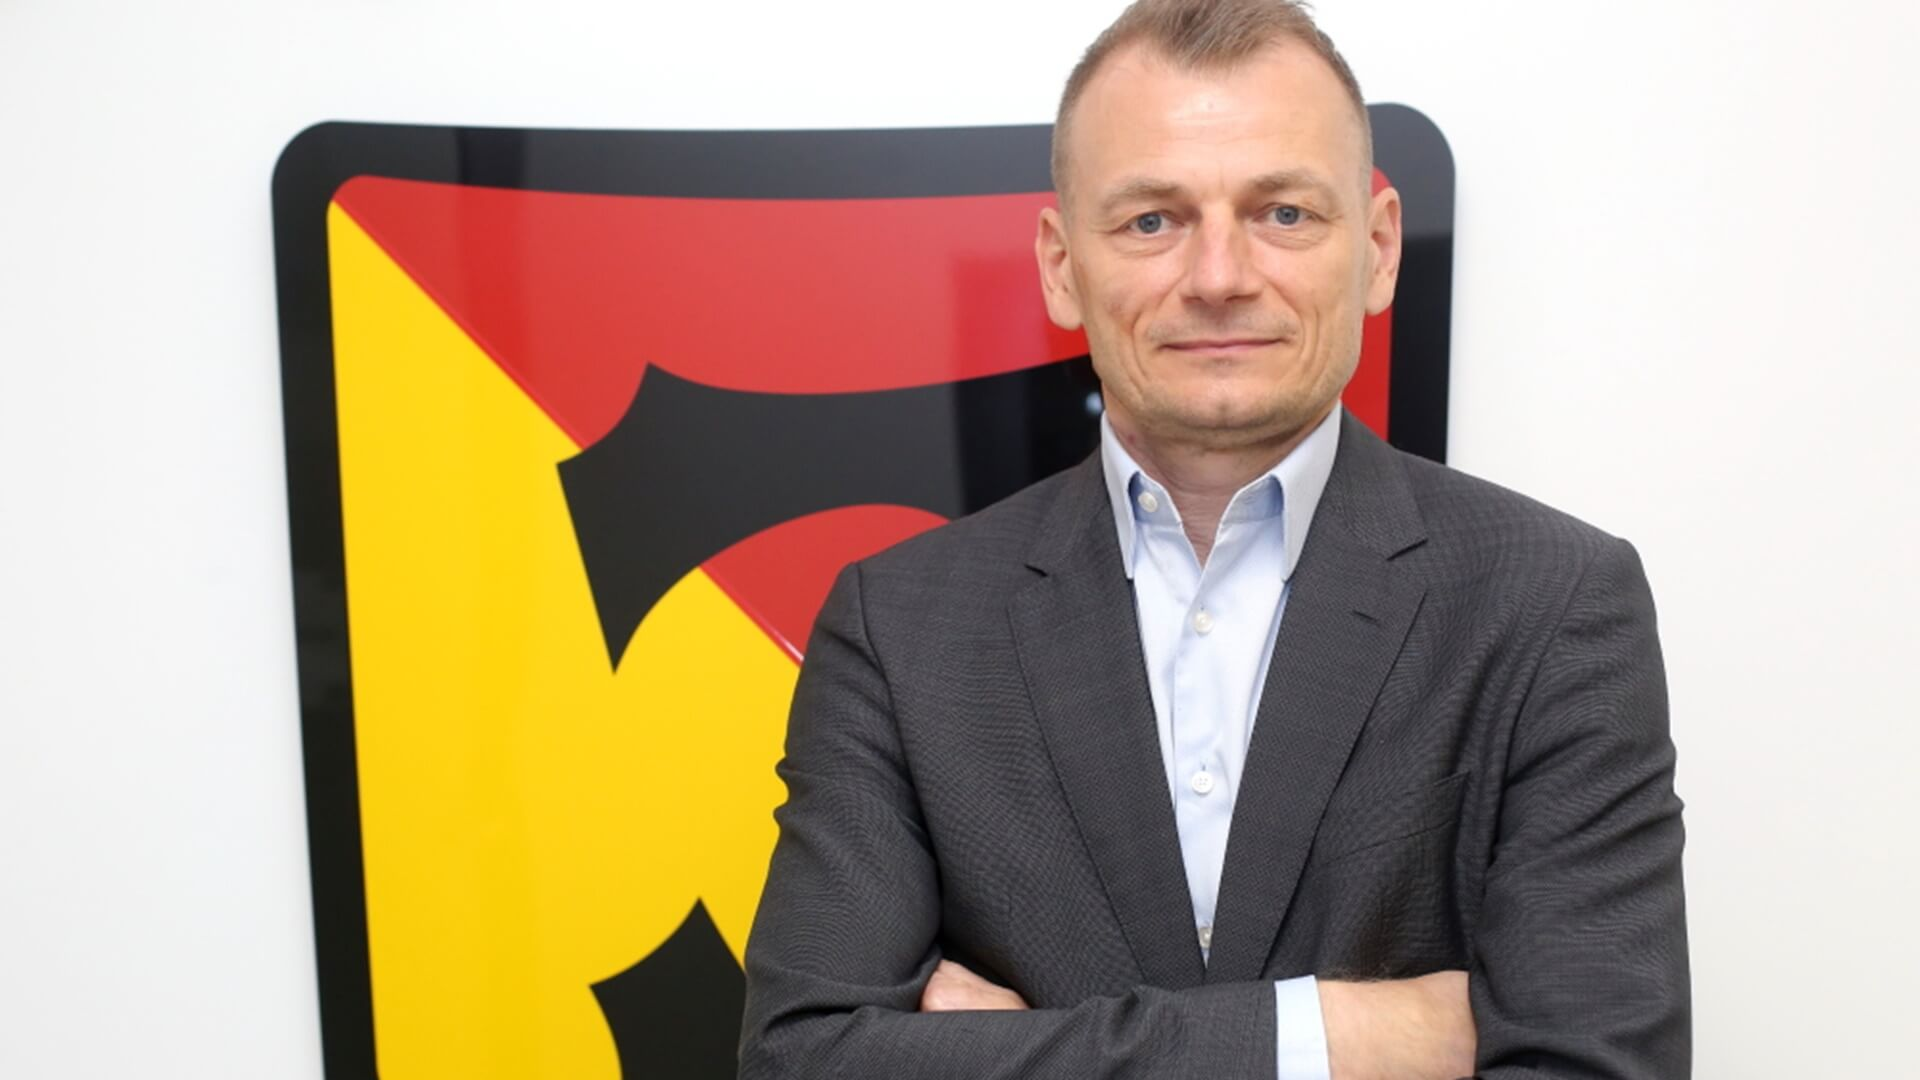 Bogdan Zając, źródło: jagiellonia.pl